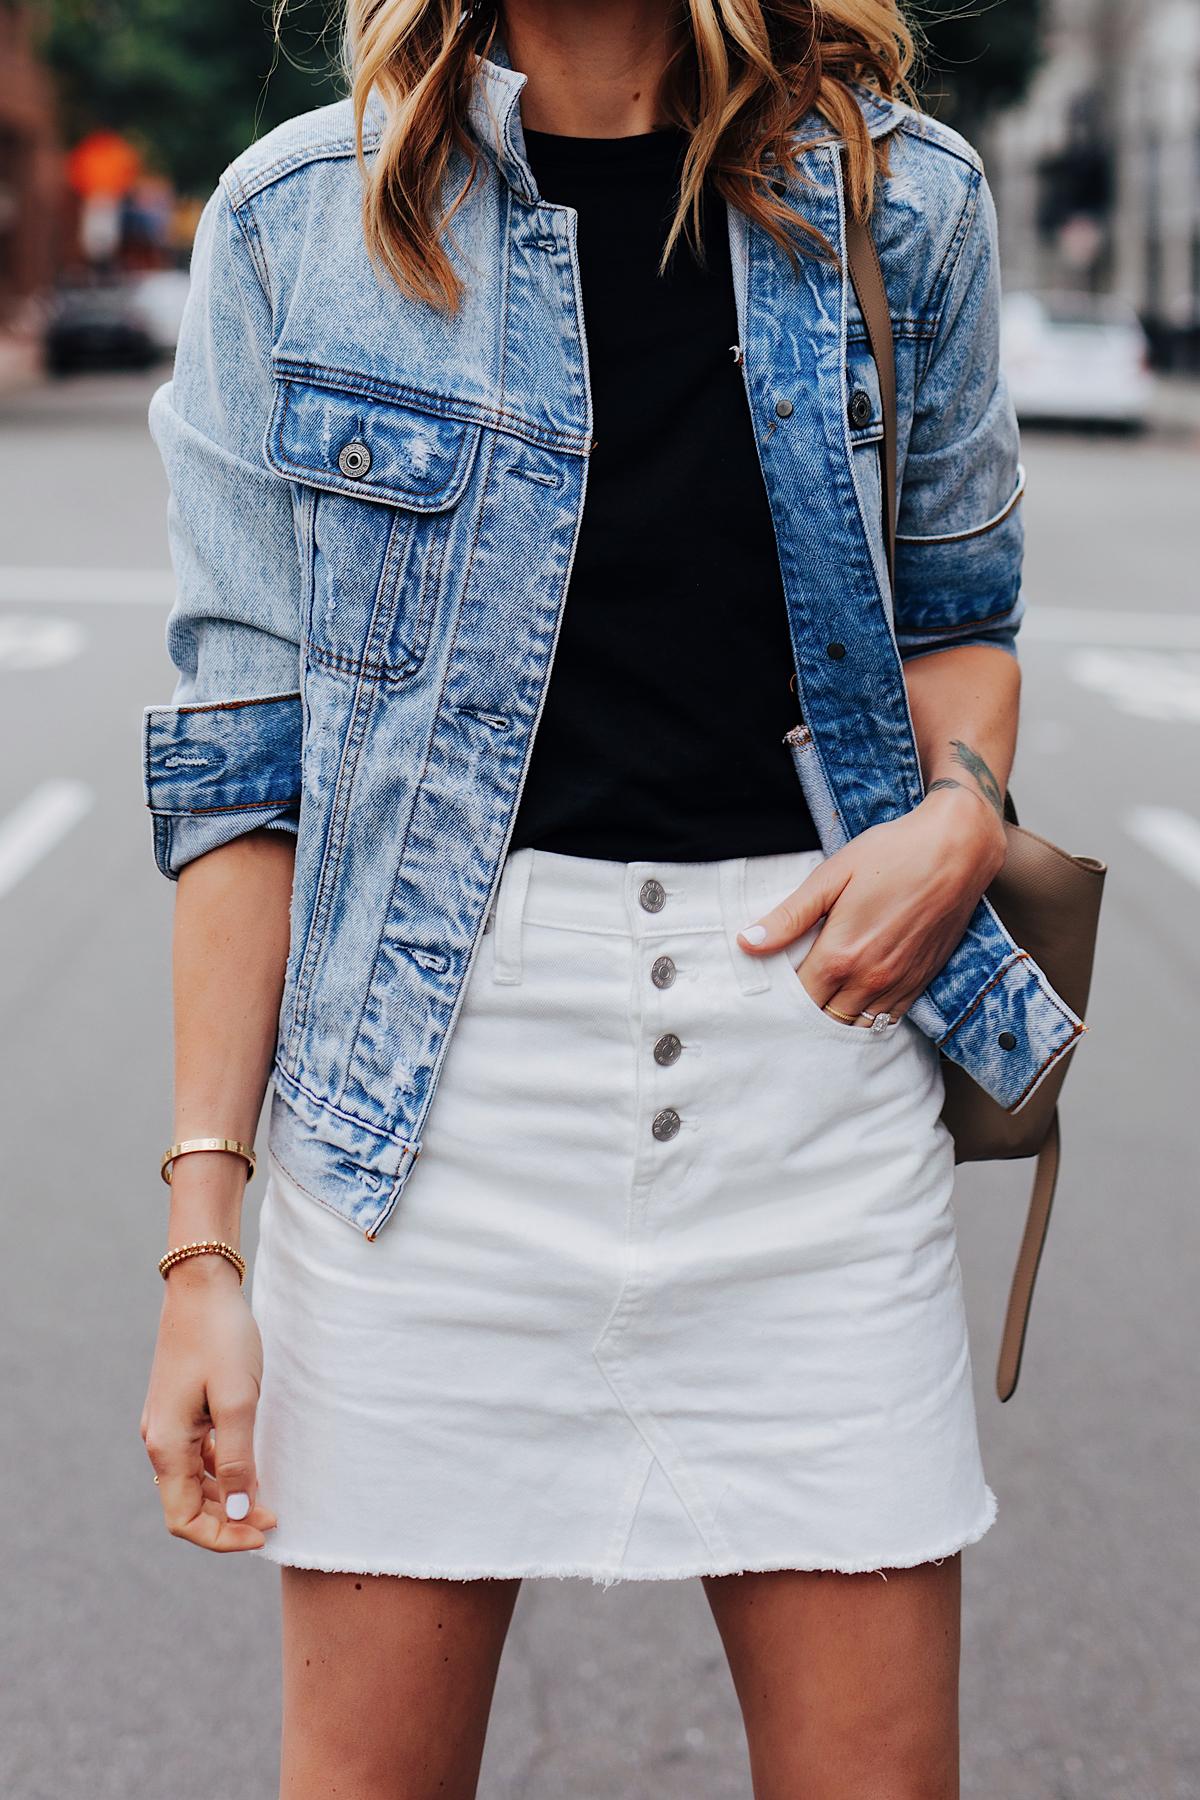 Fashion Jackson Wearing Oversized Denim Jacket Black T-Shirt White Denim Skirt